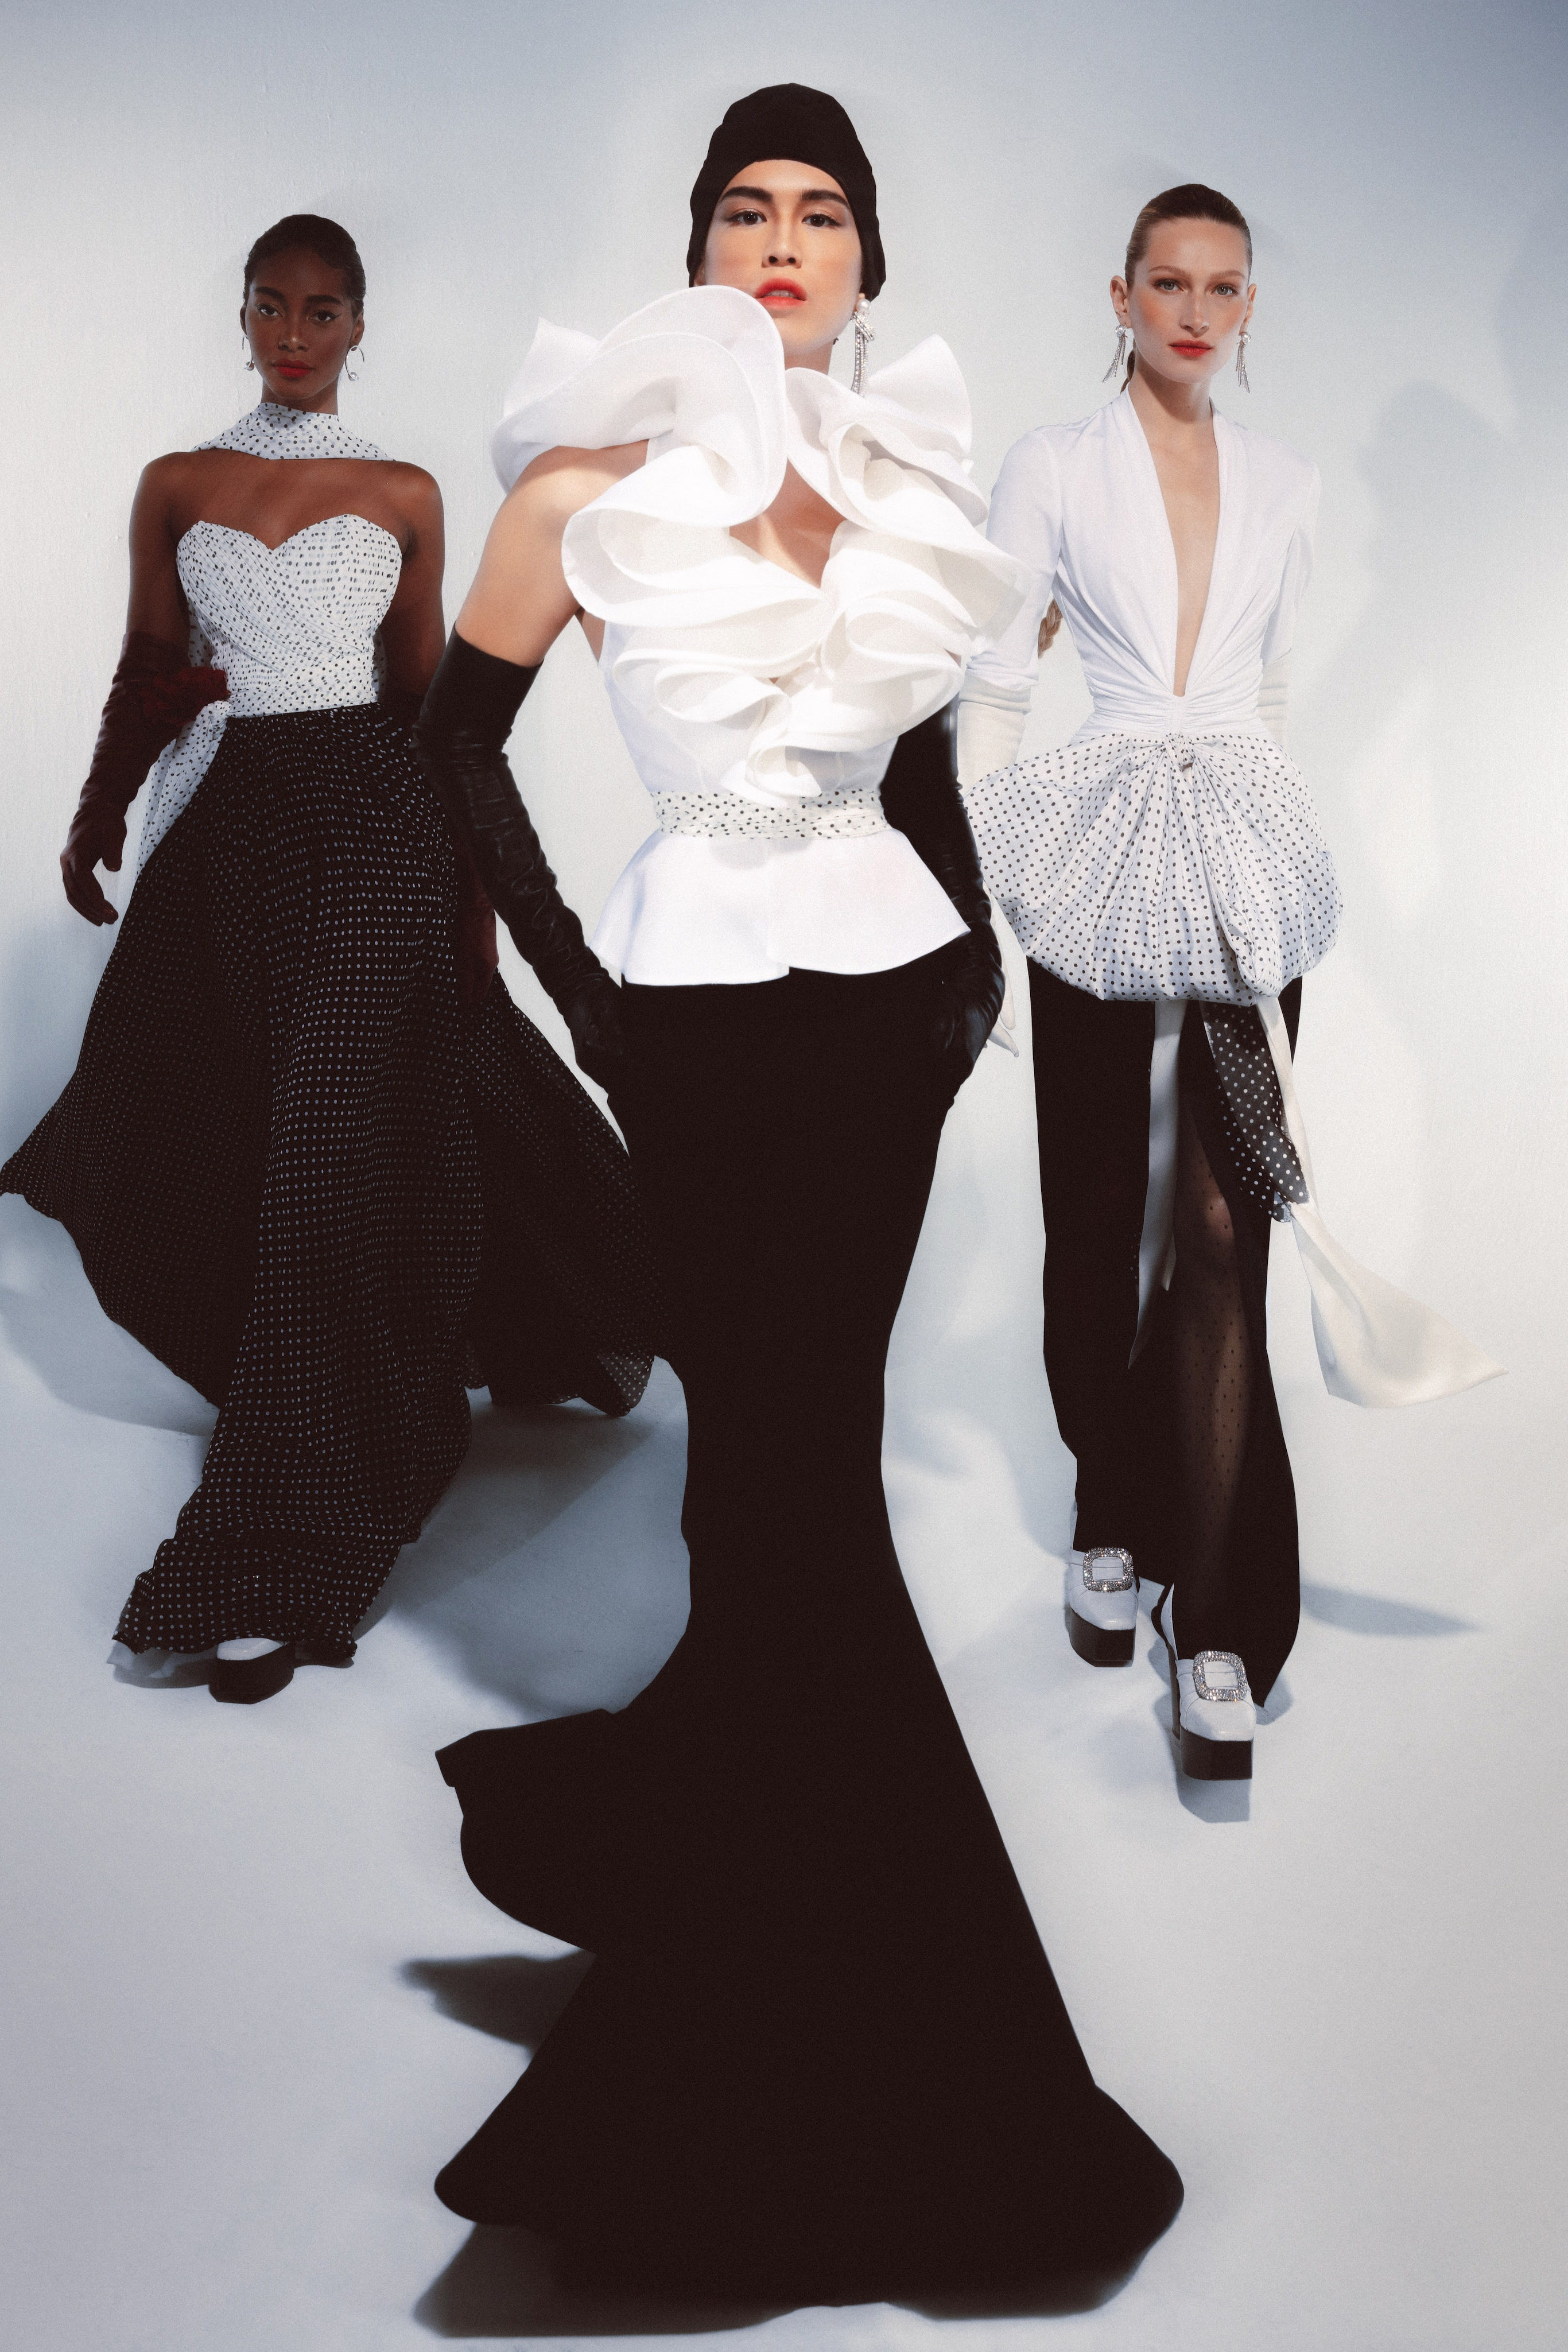 nyfw-new-york-fashion-week-fw21-february-2021-best-looks--highlights